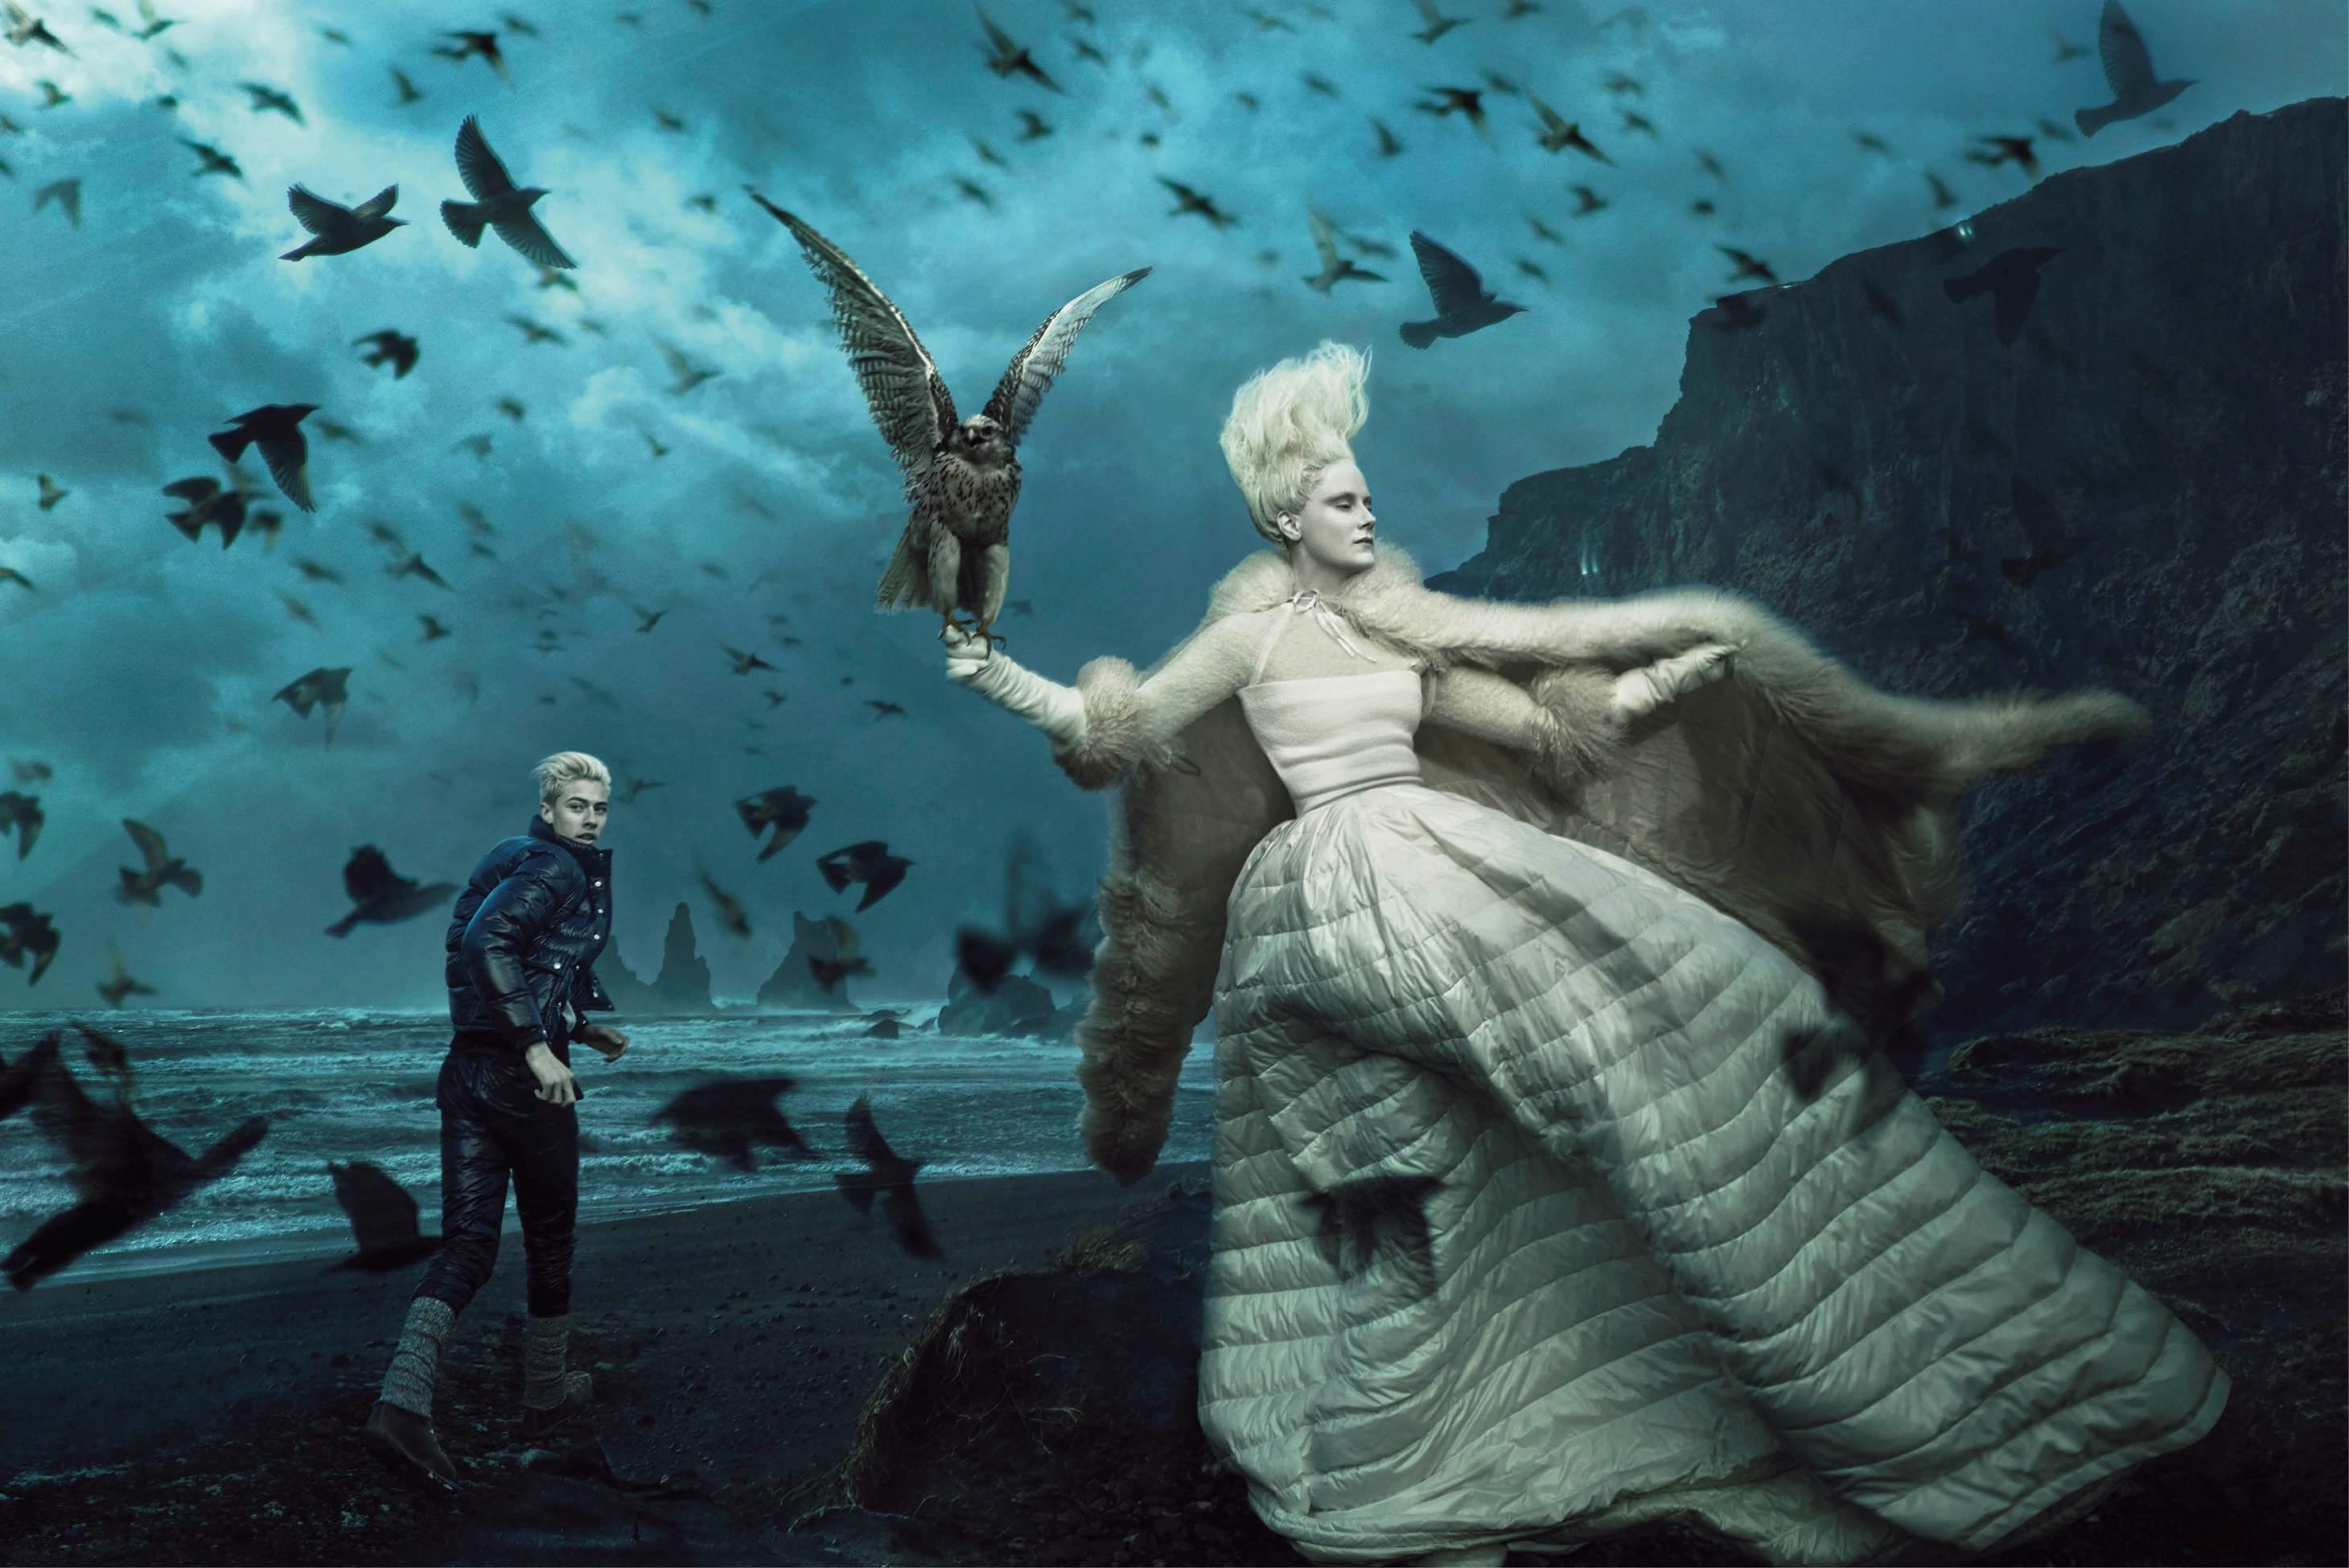 Moncler F/W 15 ad by Annie Leibovitz